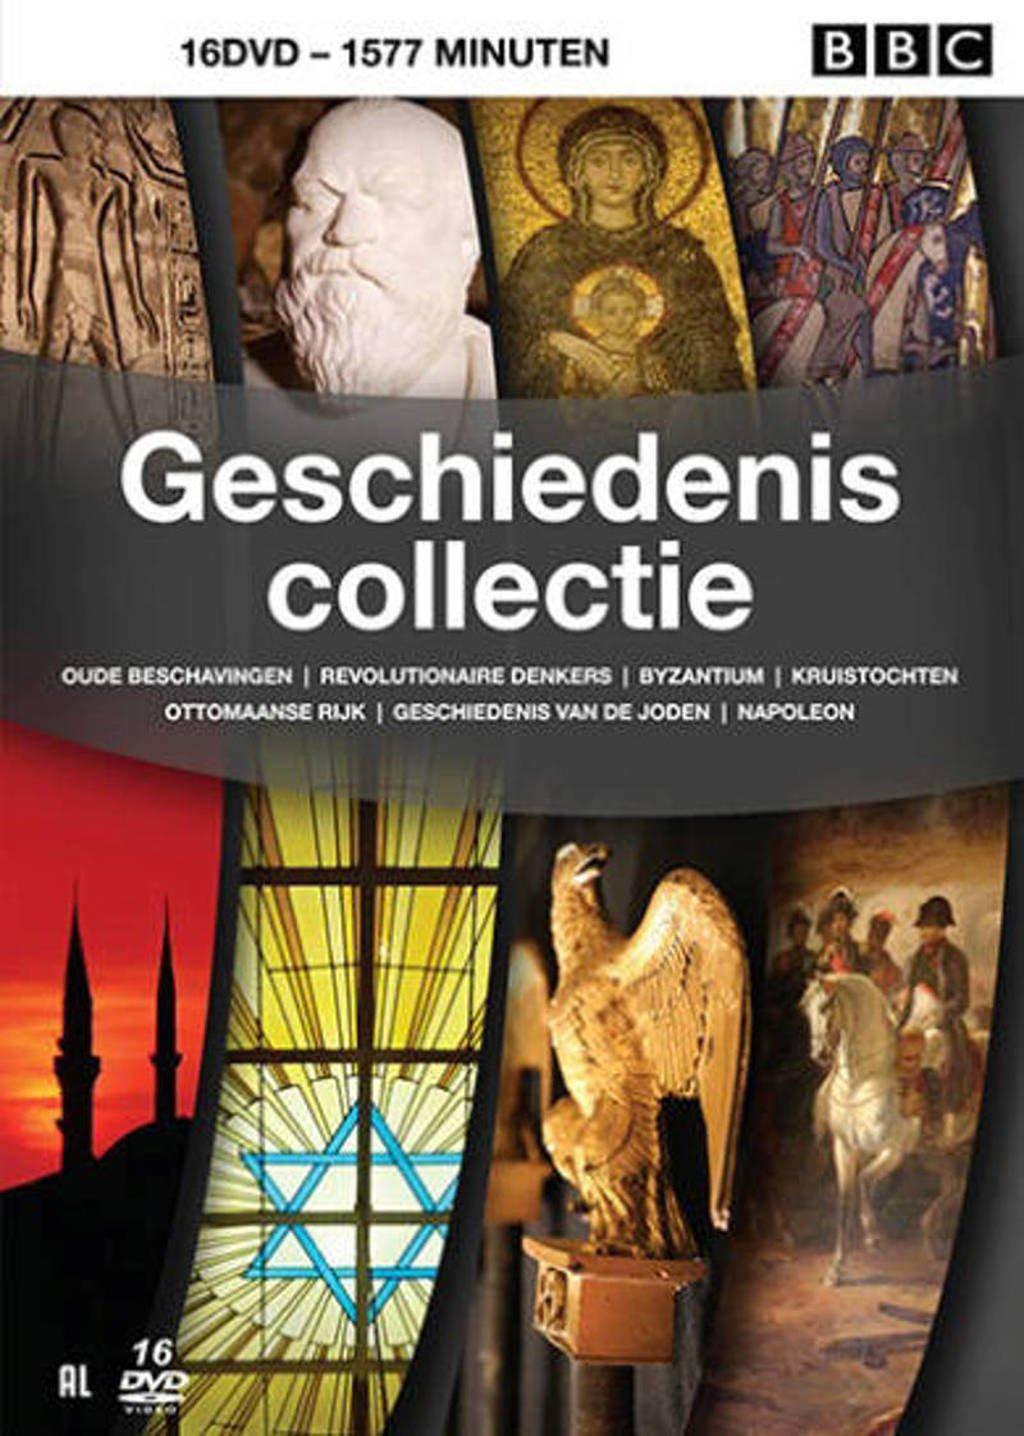 Geschiedenis collectie (16 DVD) (DVD)